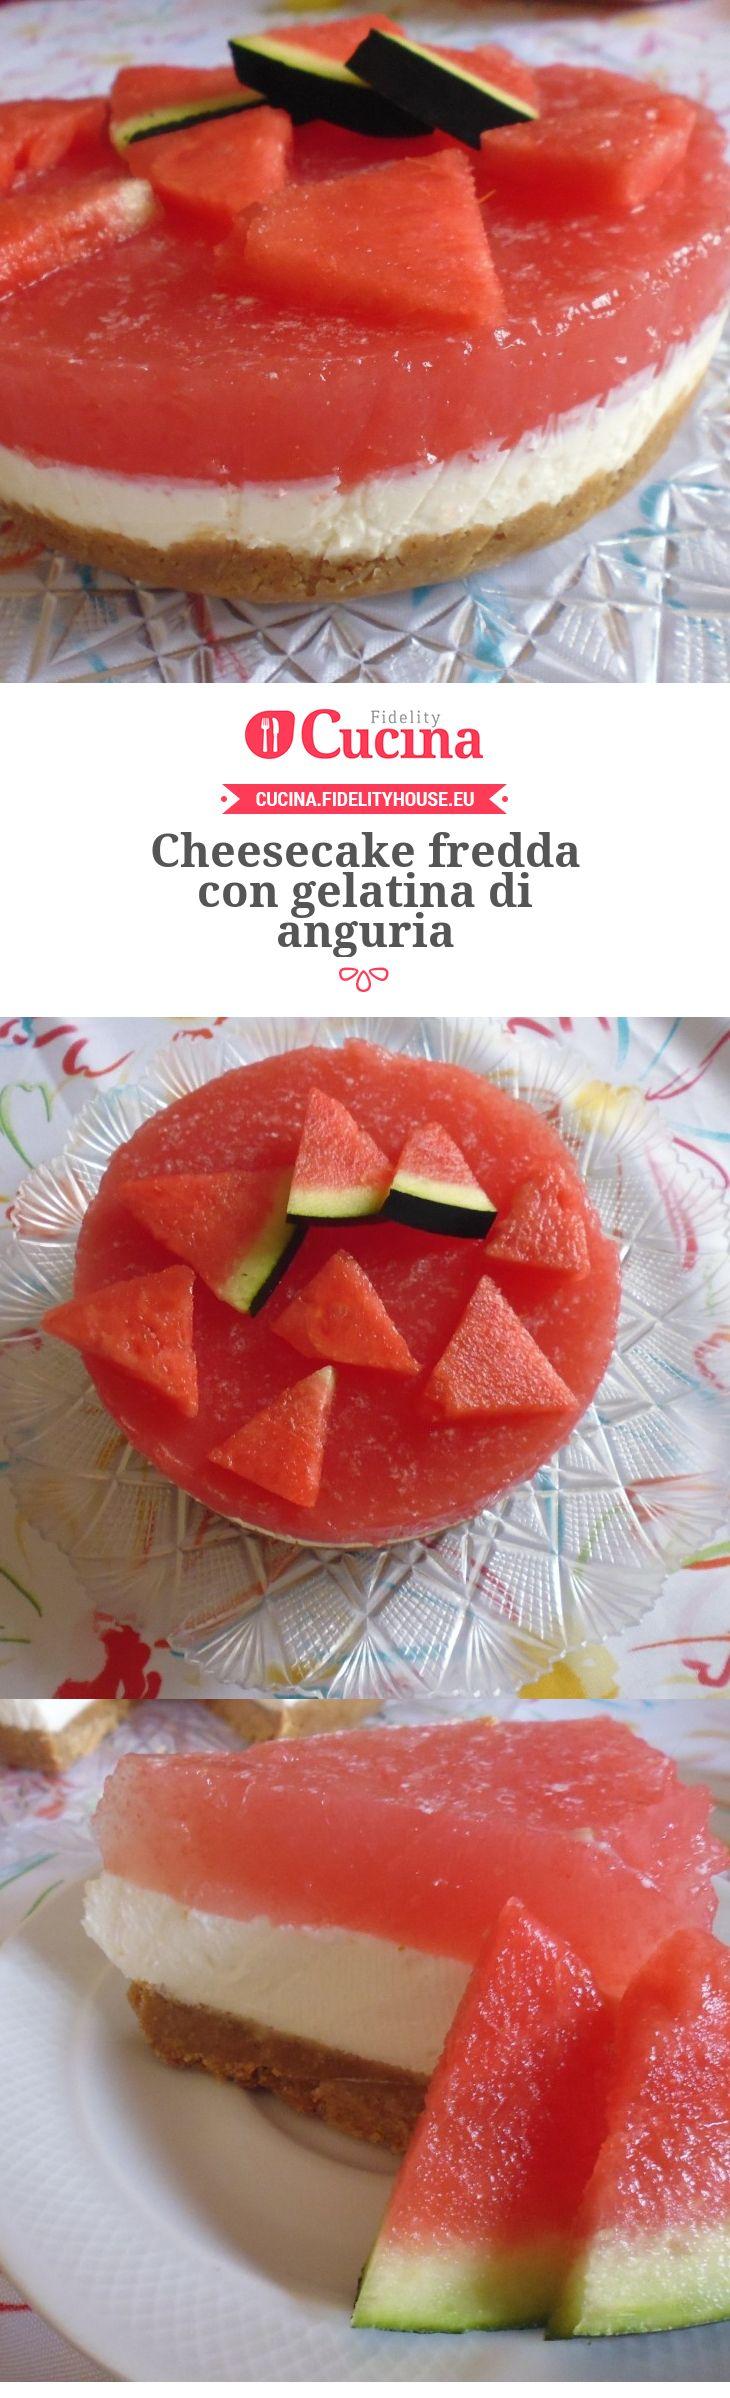 Cheesecake fredda con gelatina di anguria